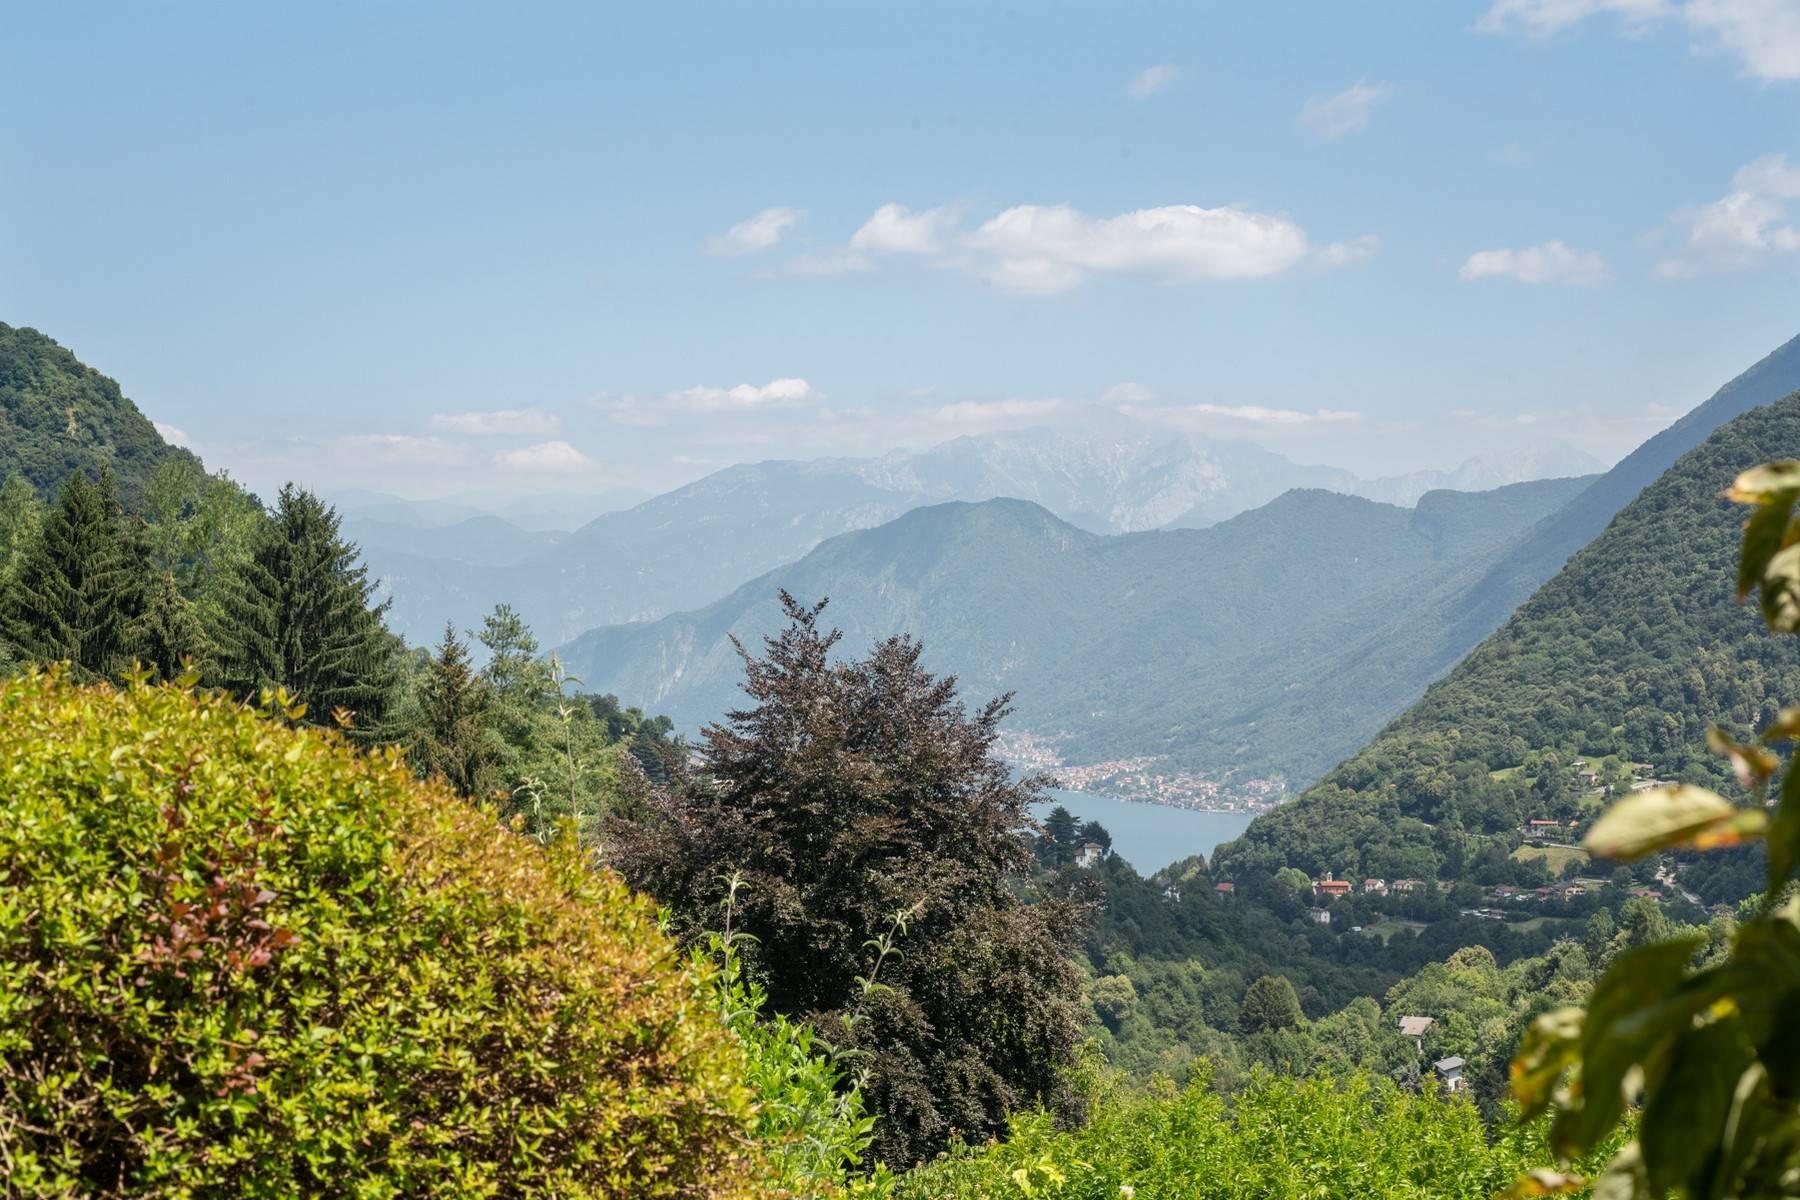 Splendida villa moderna sulla collina soleggiata sopra Argegno - 3